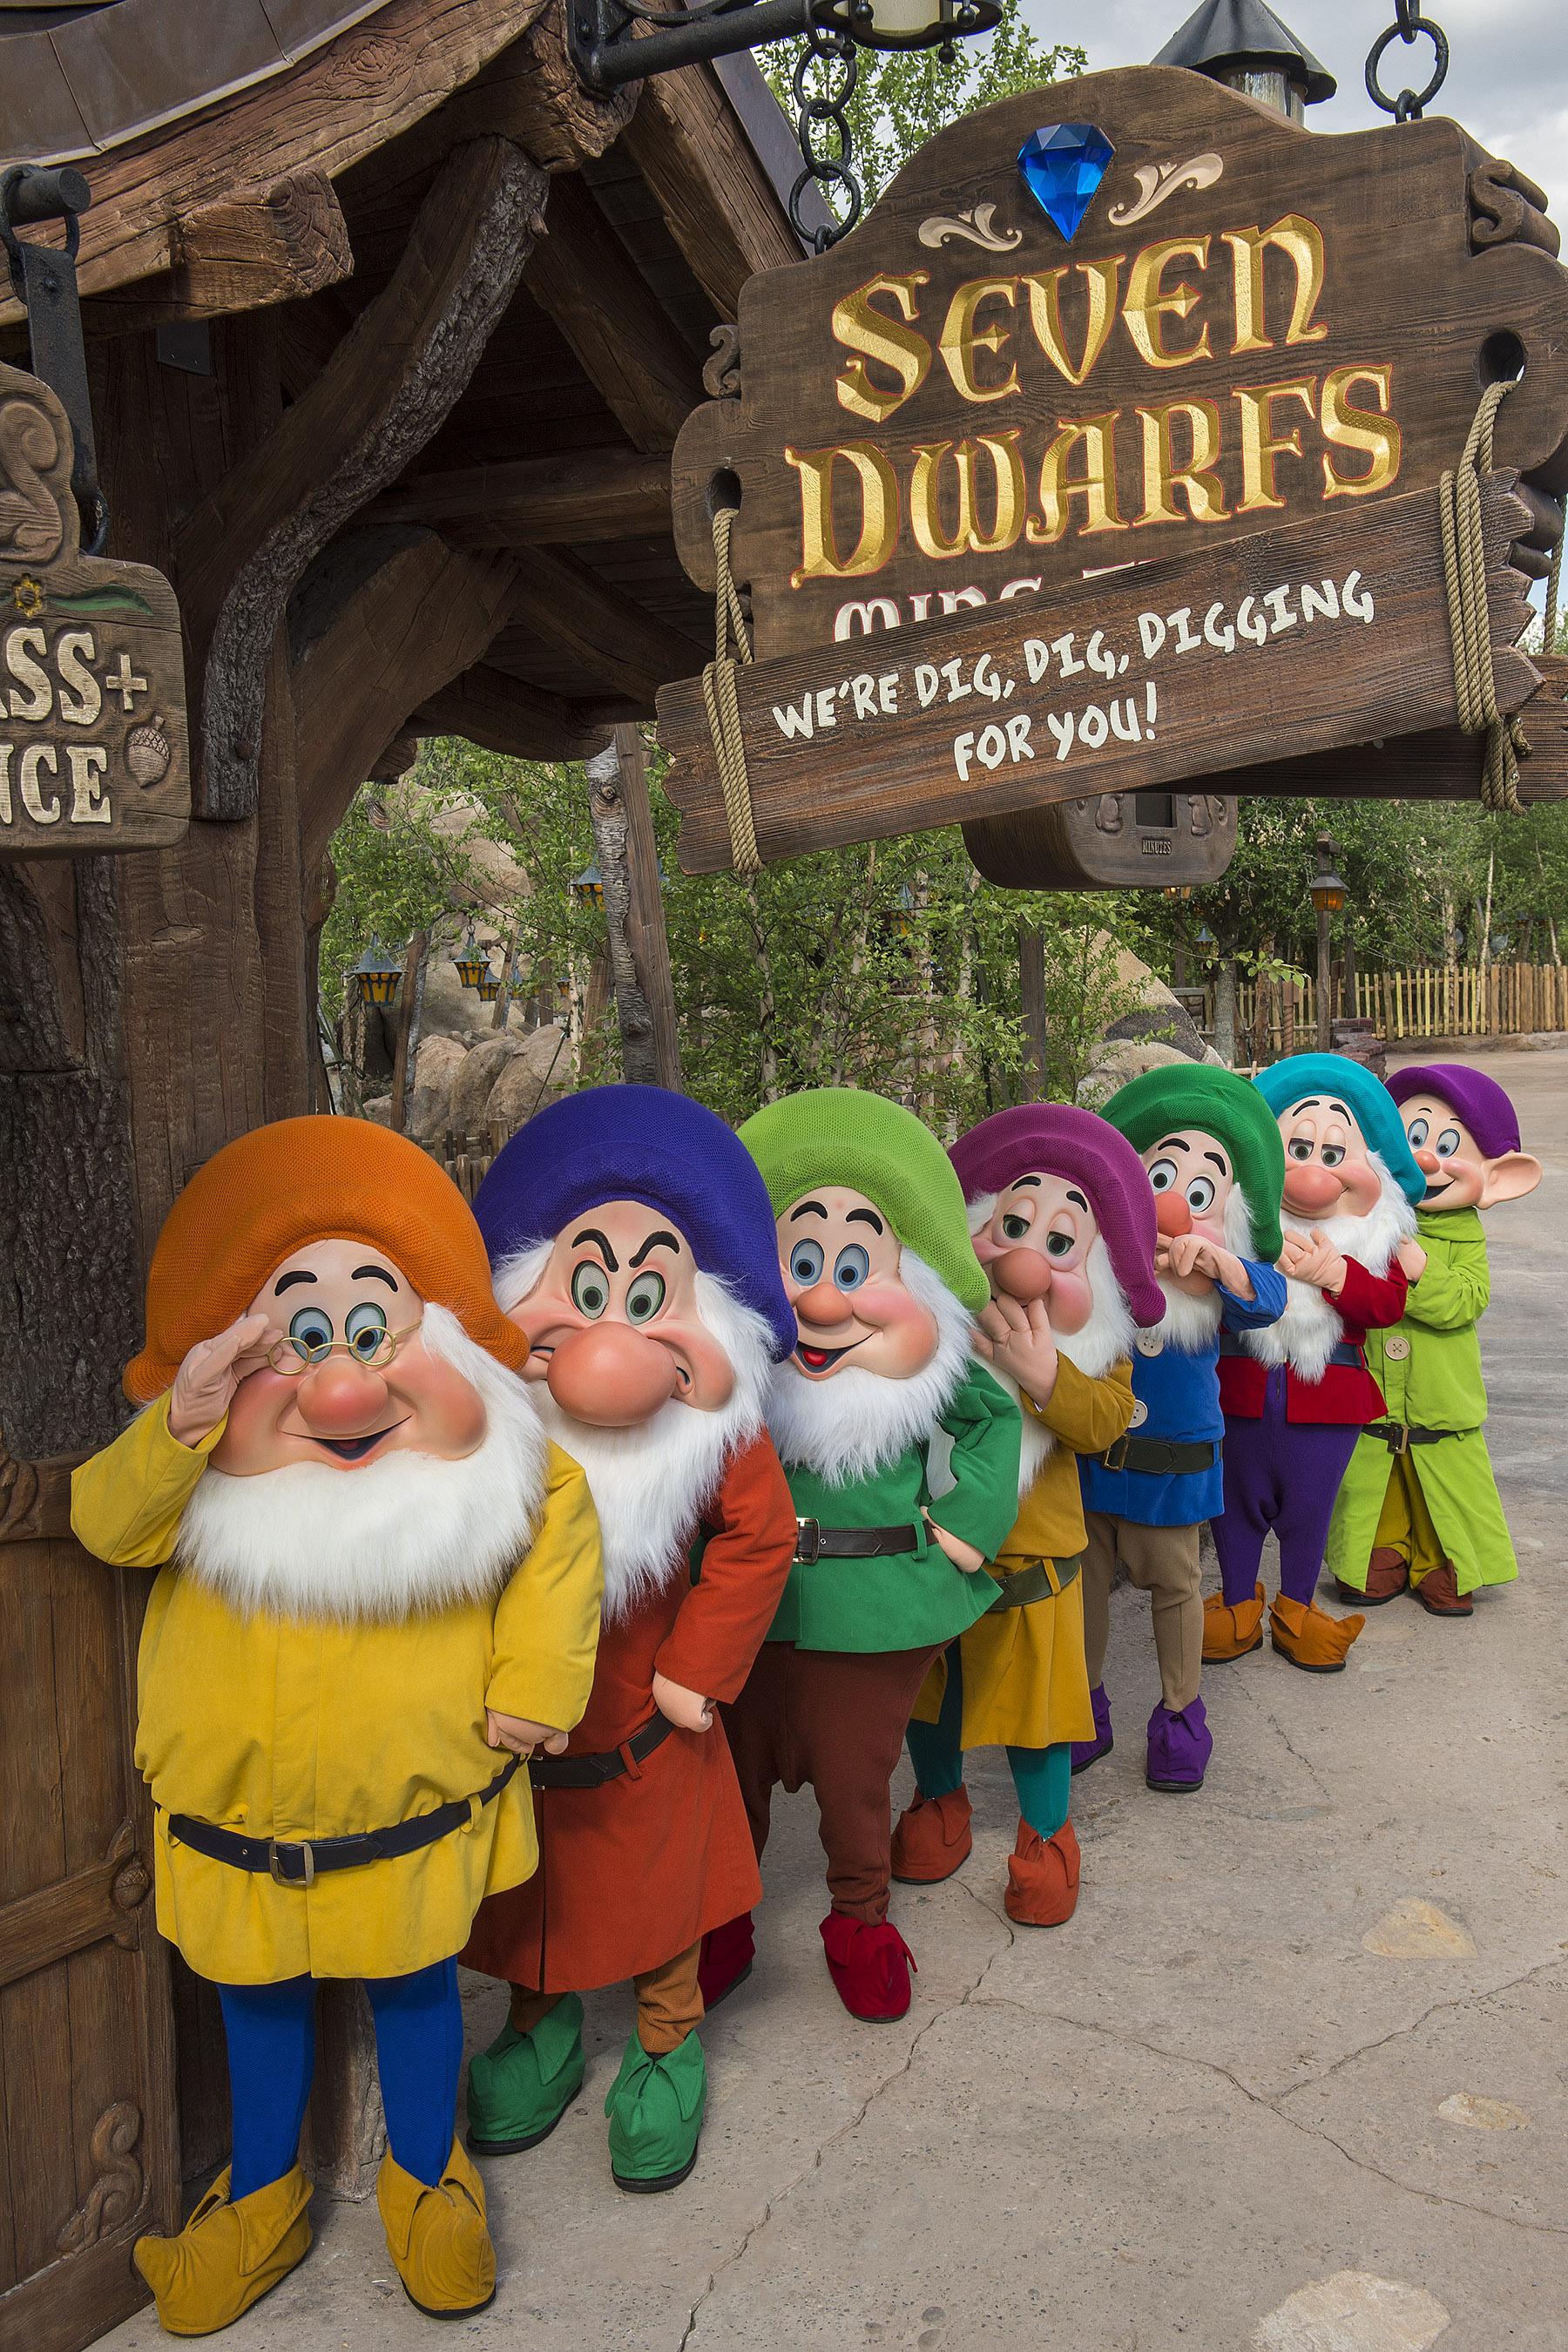 7 dwarfs disney ride